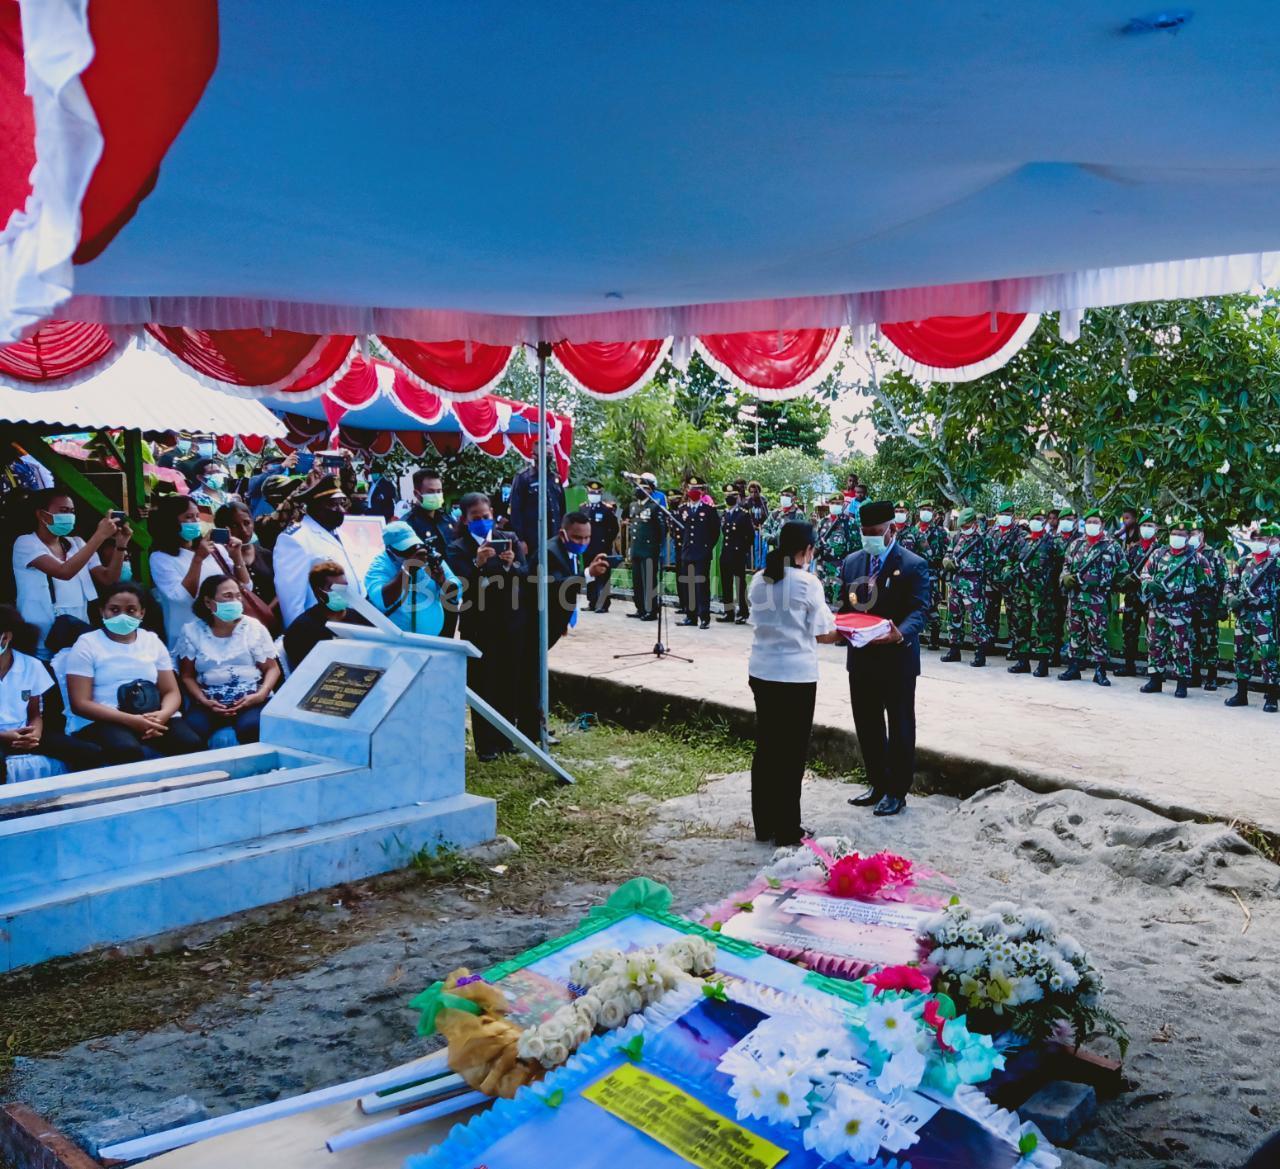 Gubernur PB, Pimpin Pemakaman Alm. Bupati Manokwari Demas Paulus Mandacan 4 IMG 20200423 WA0031